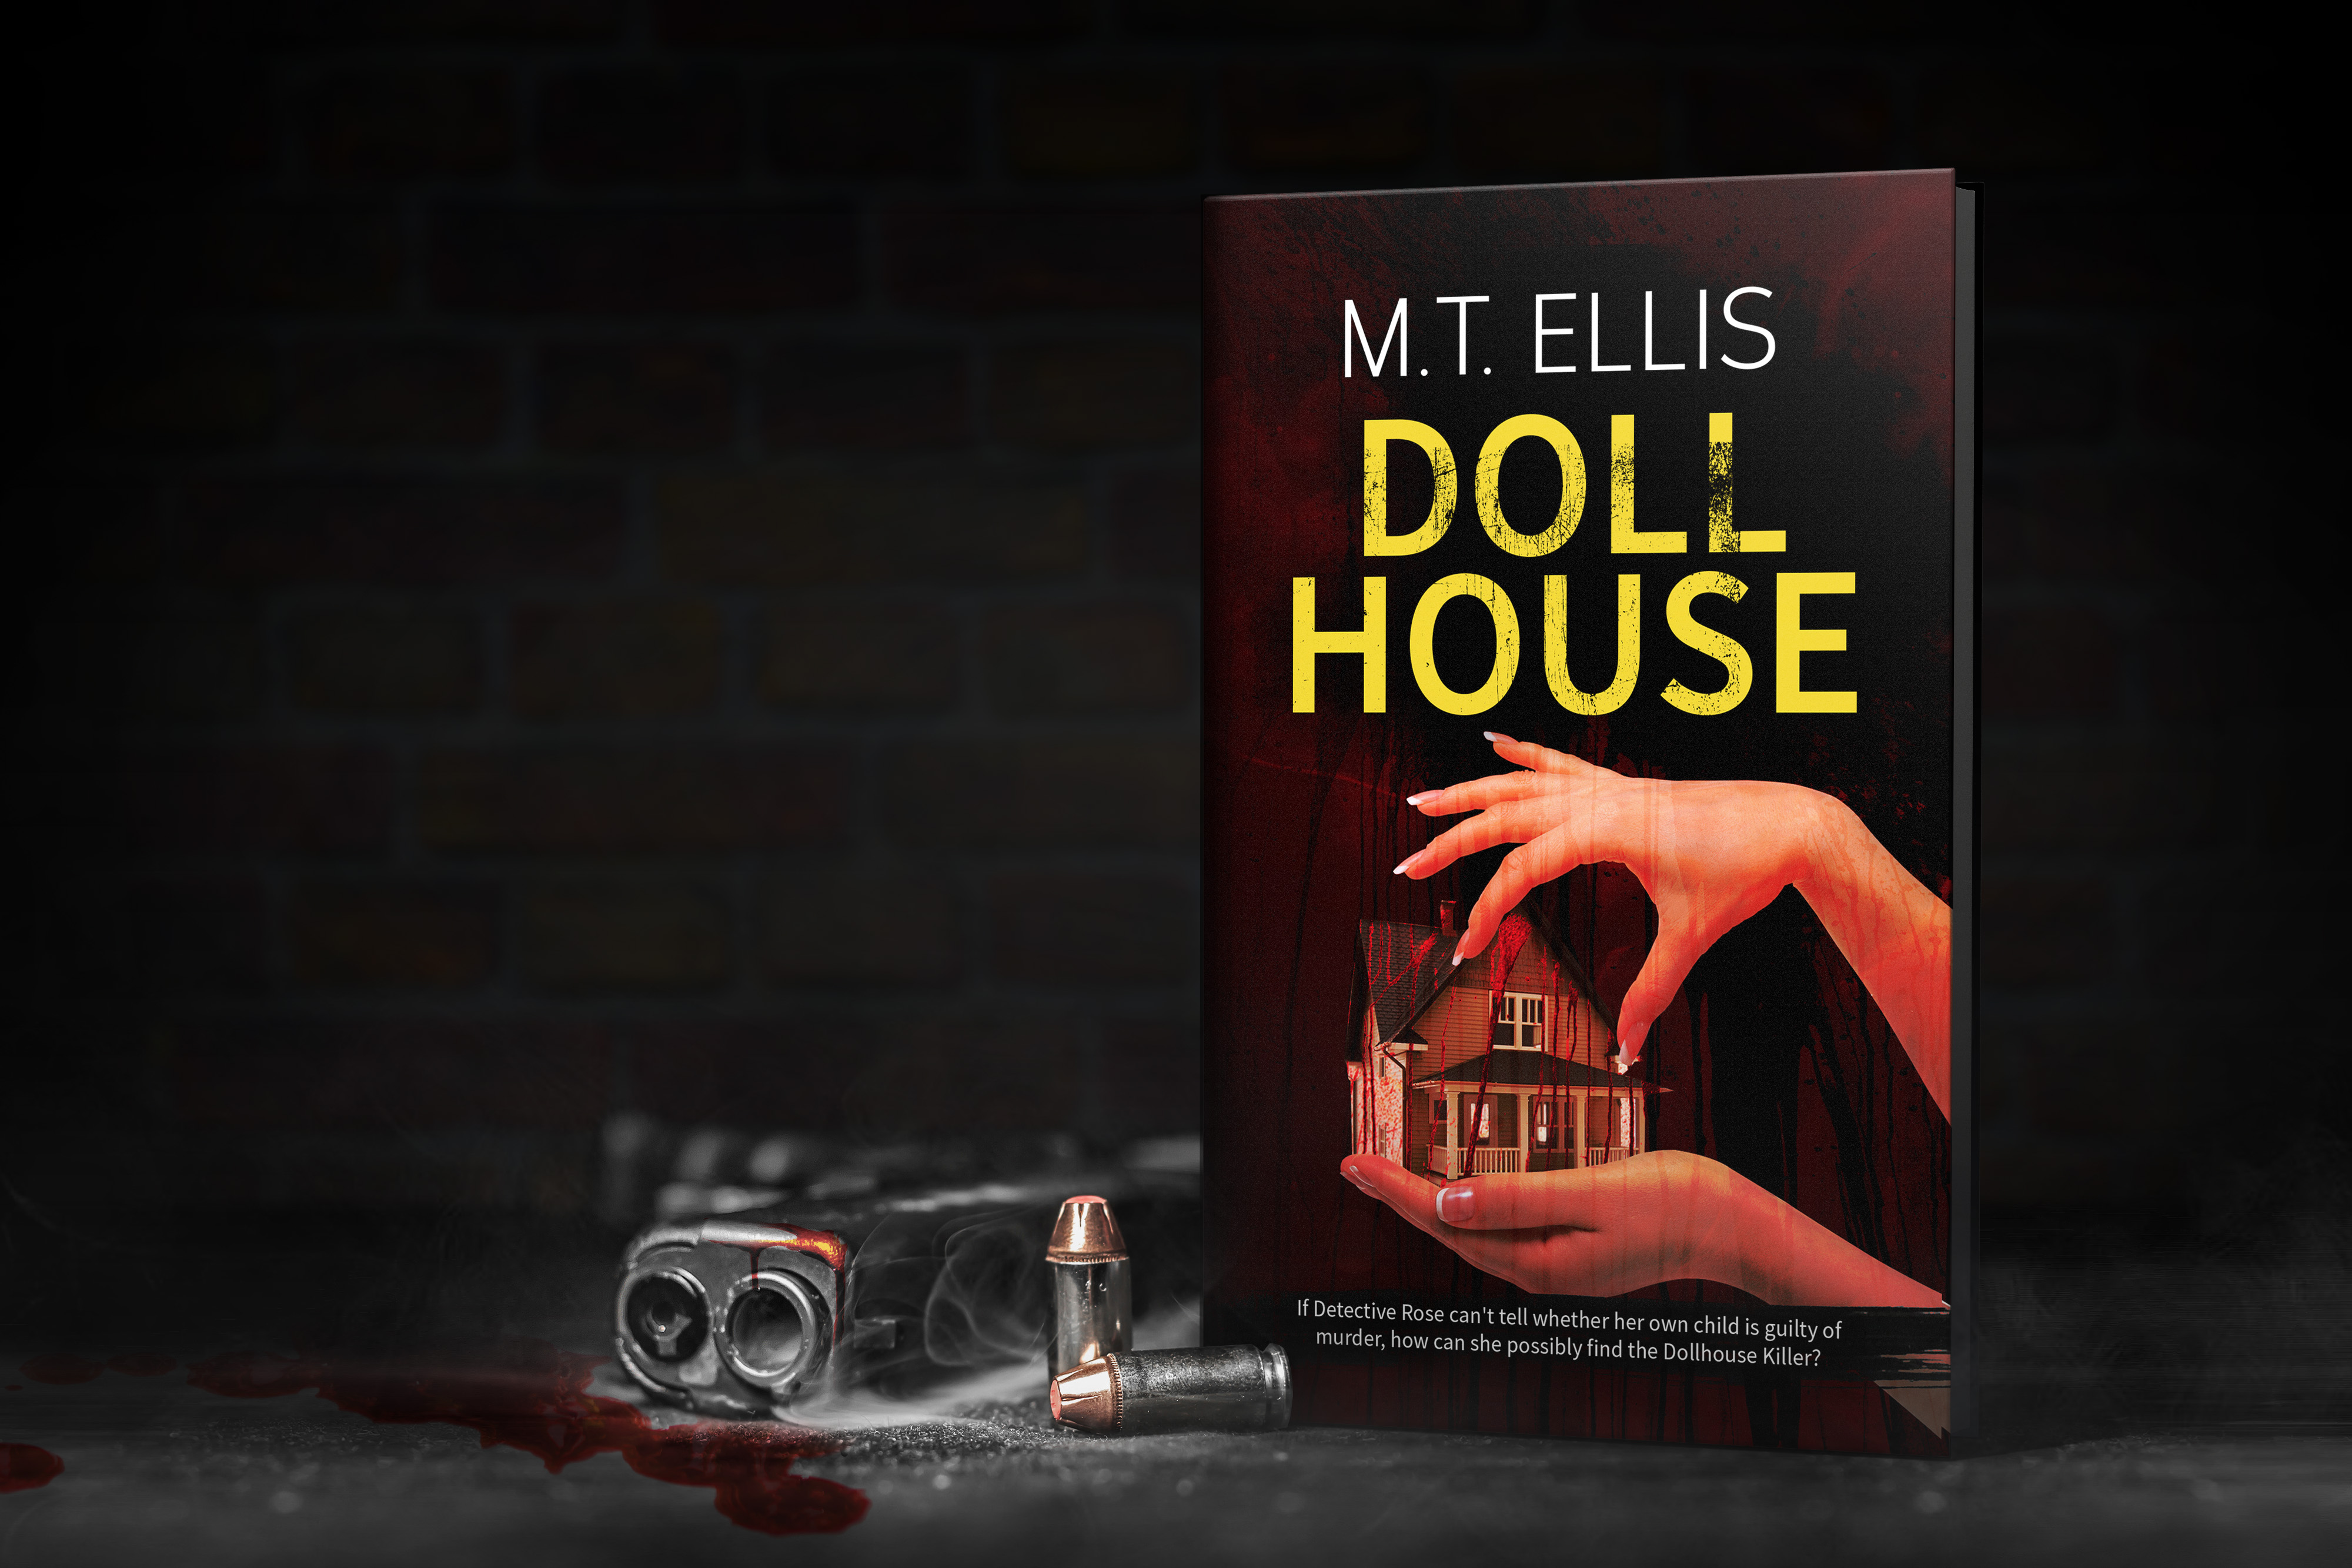 Dollhouse by M.T. Ellis